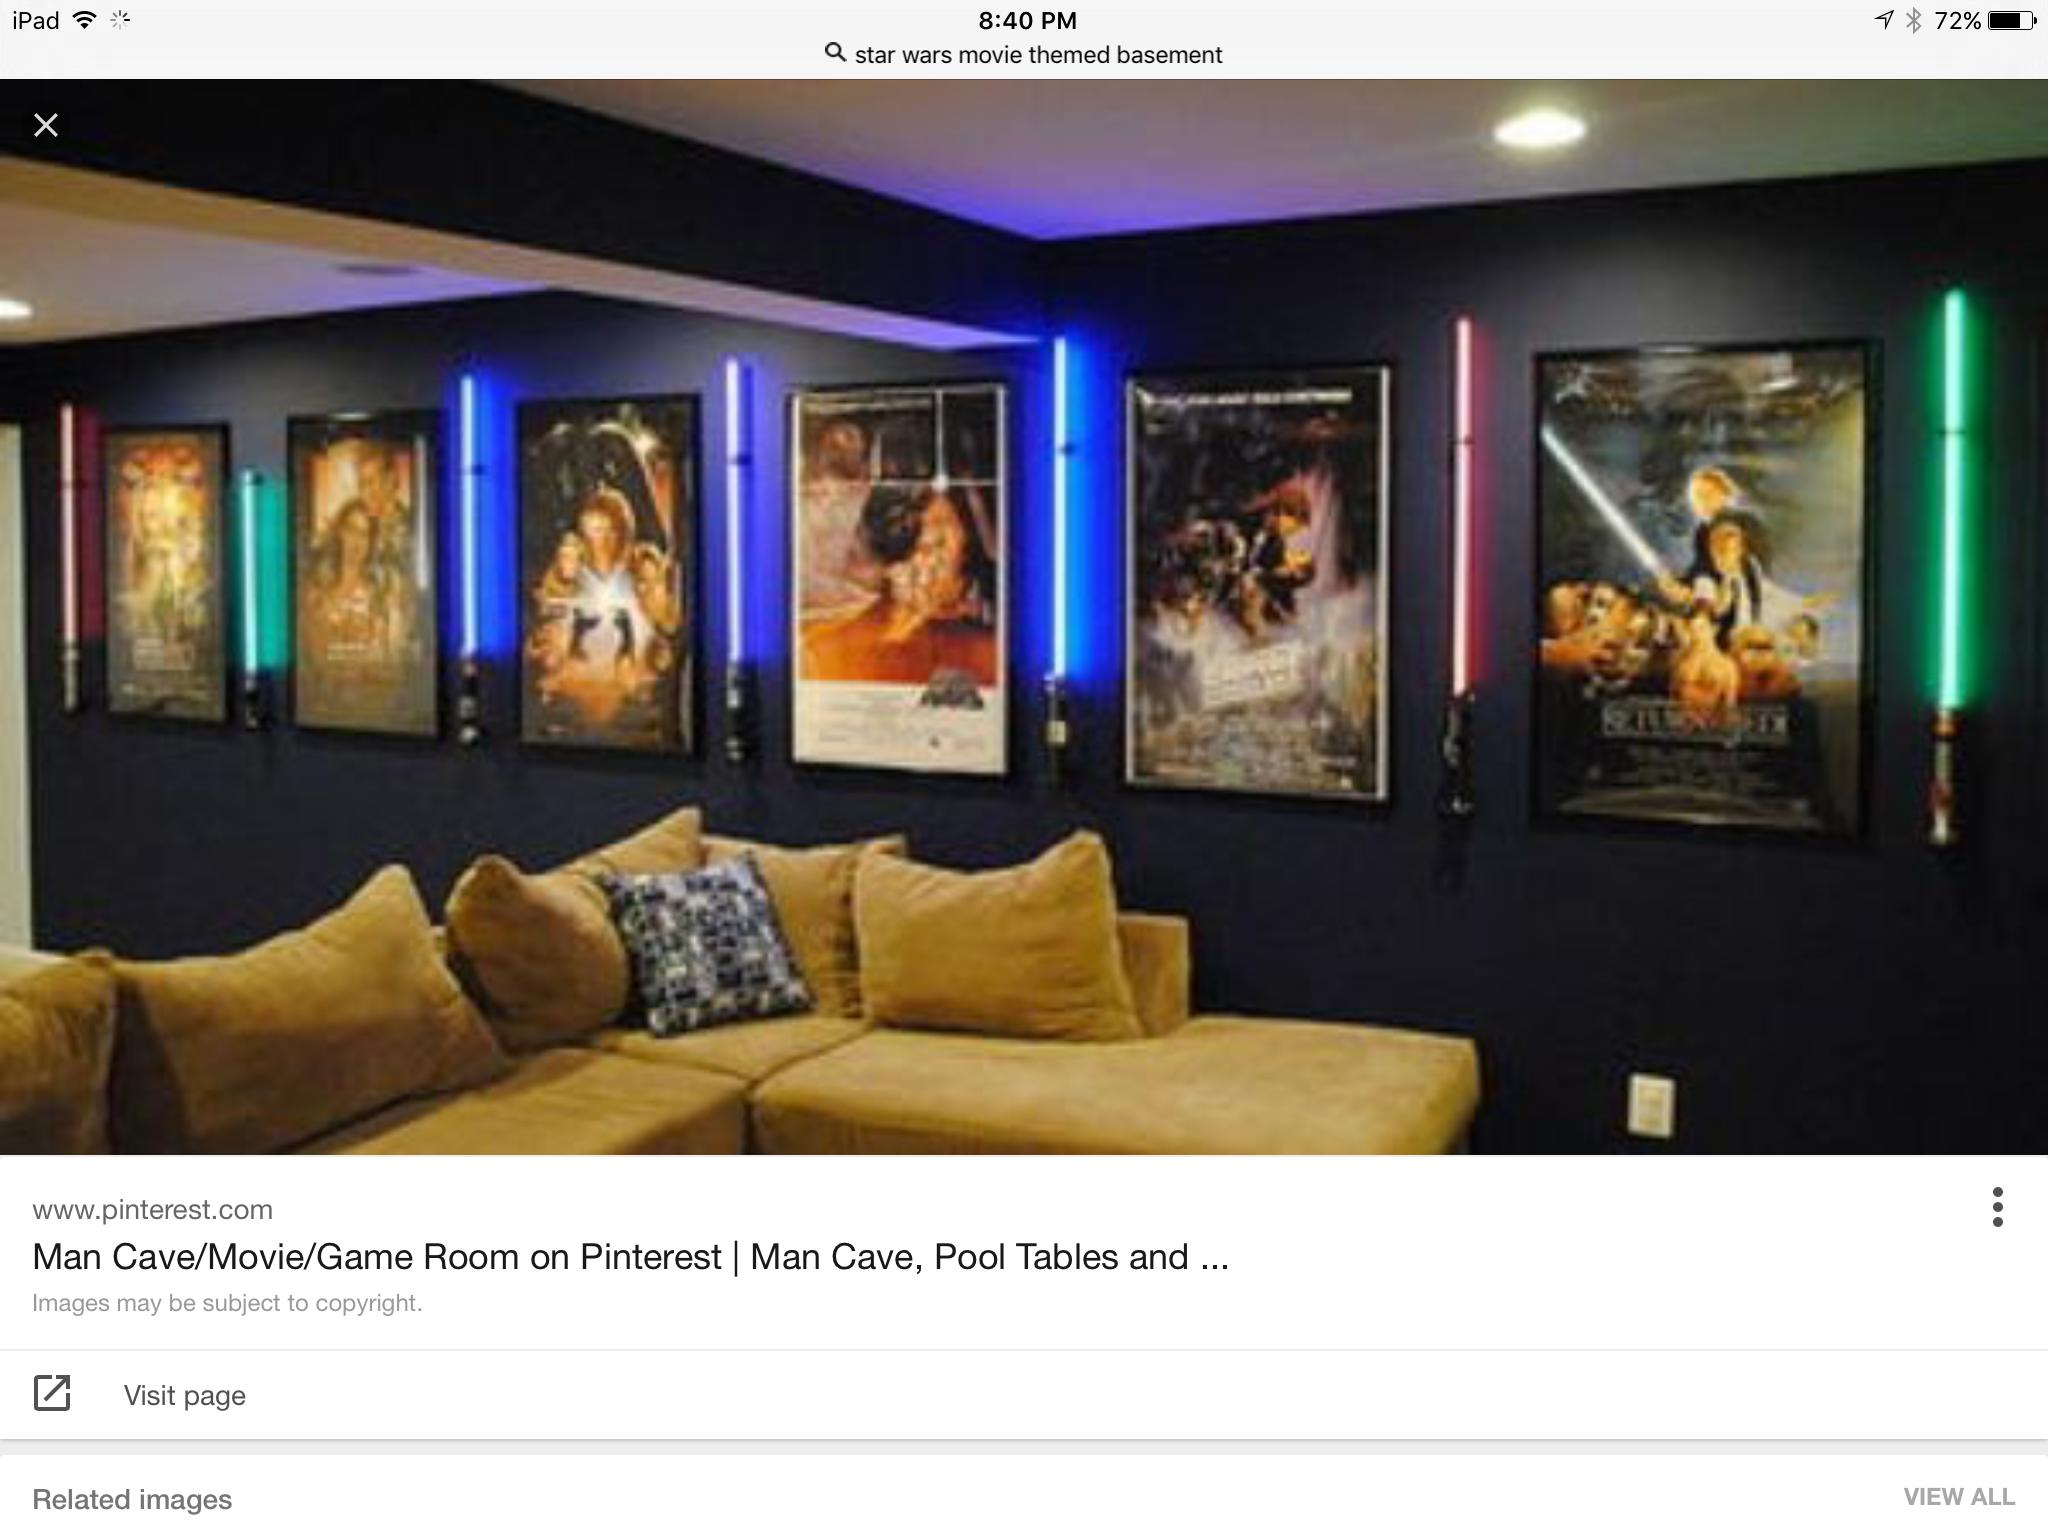 Man Cave Ideas For Quiz : Man cave decor basement tv rooms basements and men